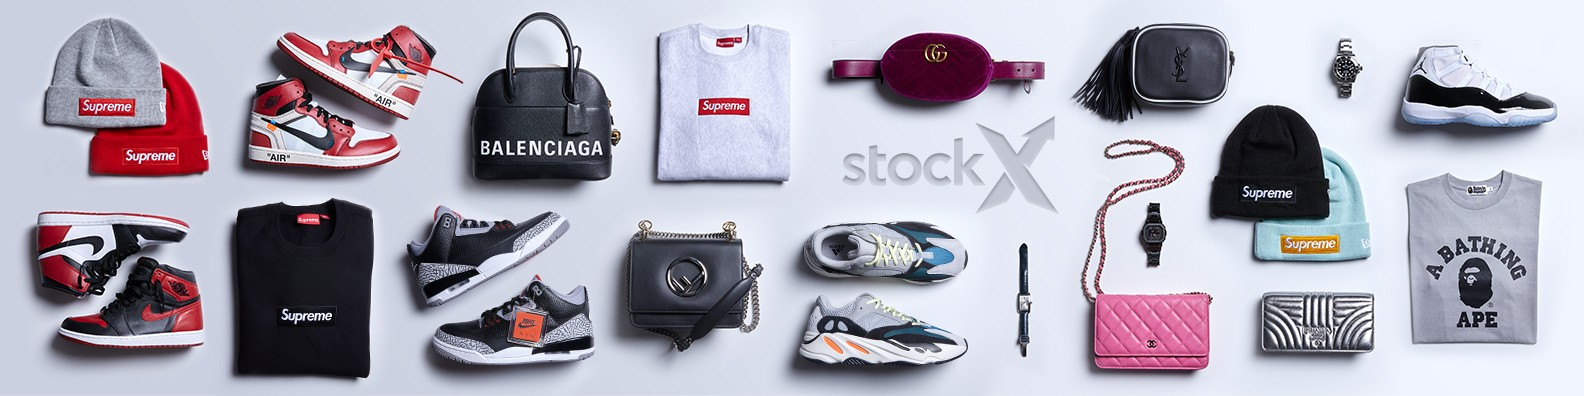 17f6eeb3 StockX cover image